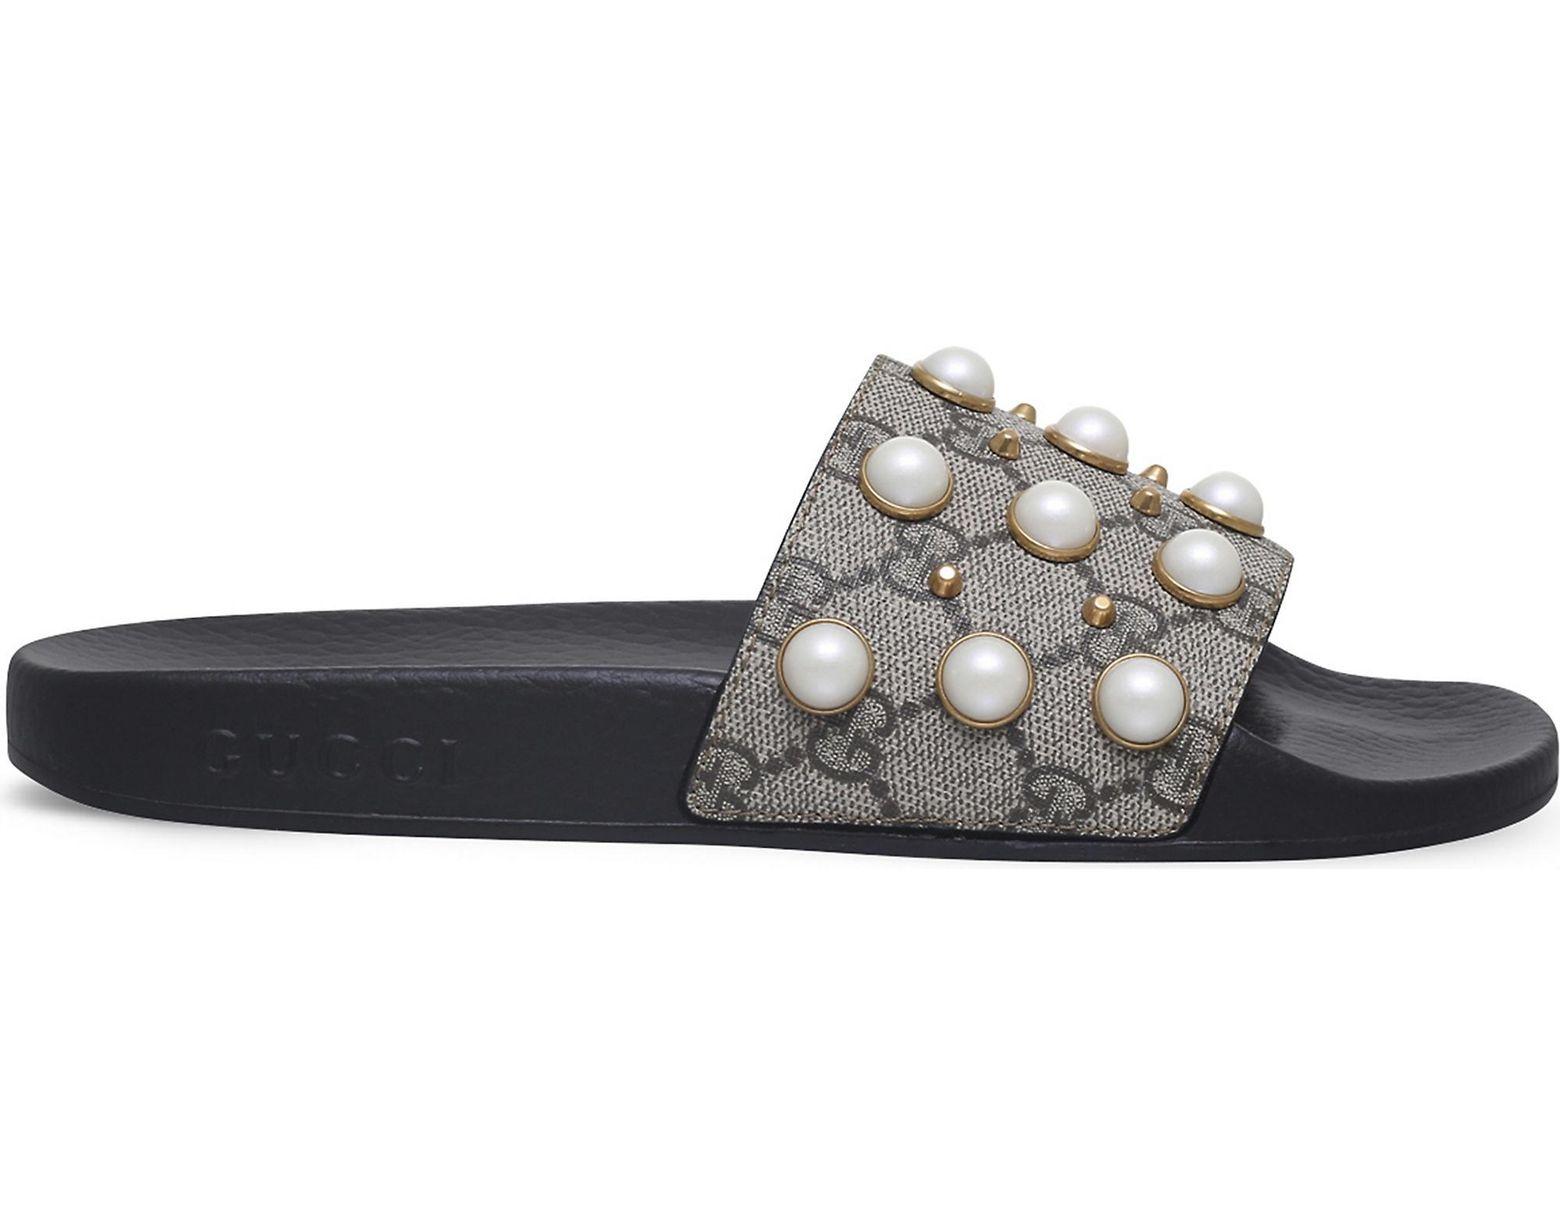 8f856c2a3 Lyst - Gucci Pursuit Pearl-embellished Rubber Slider Sandals